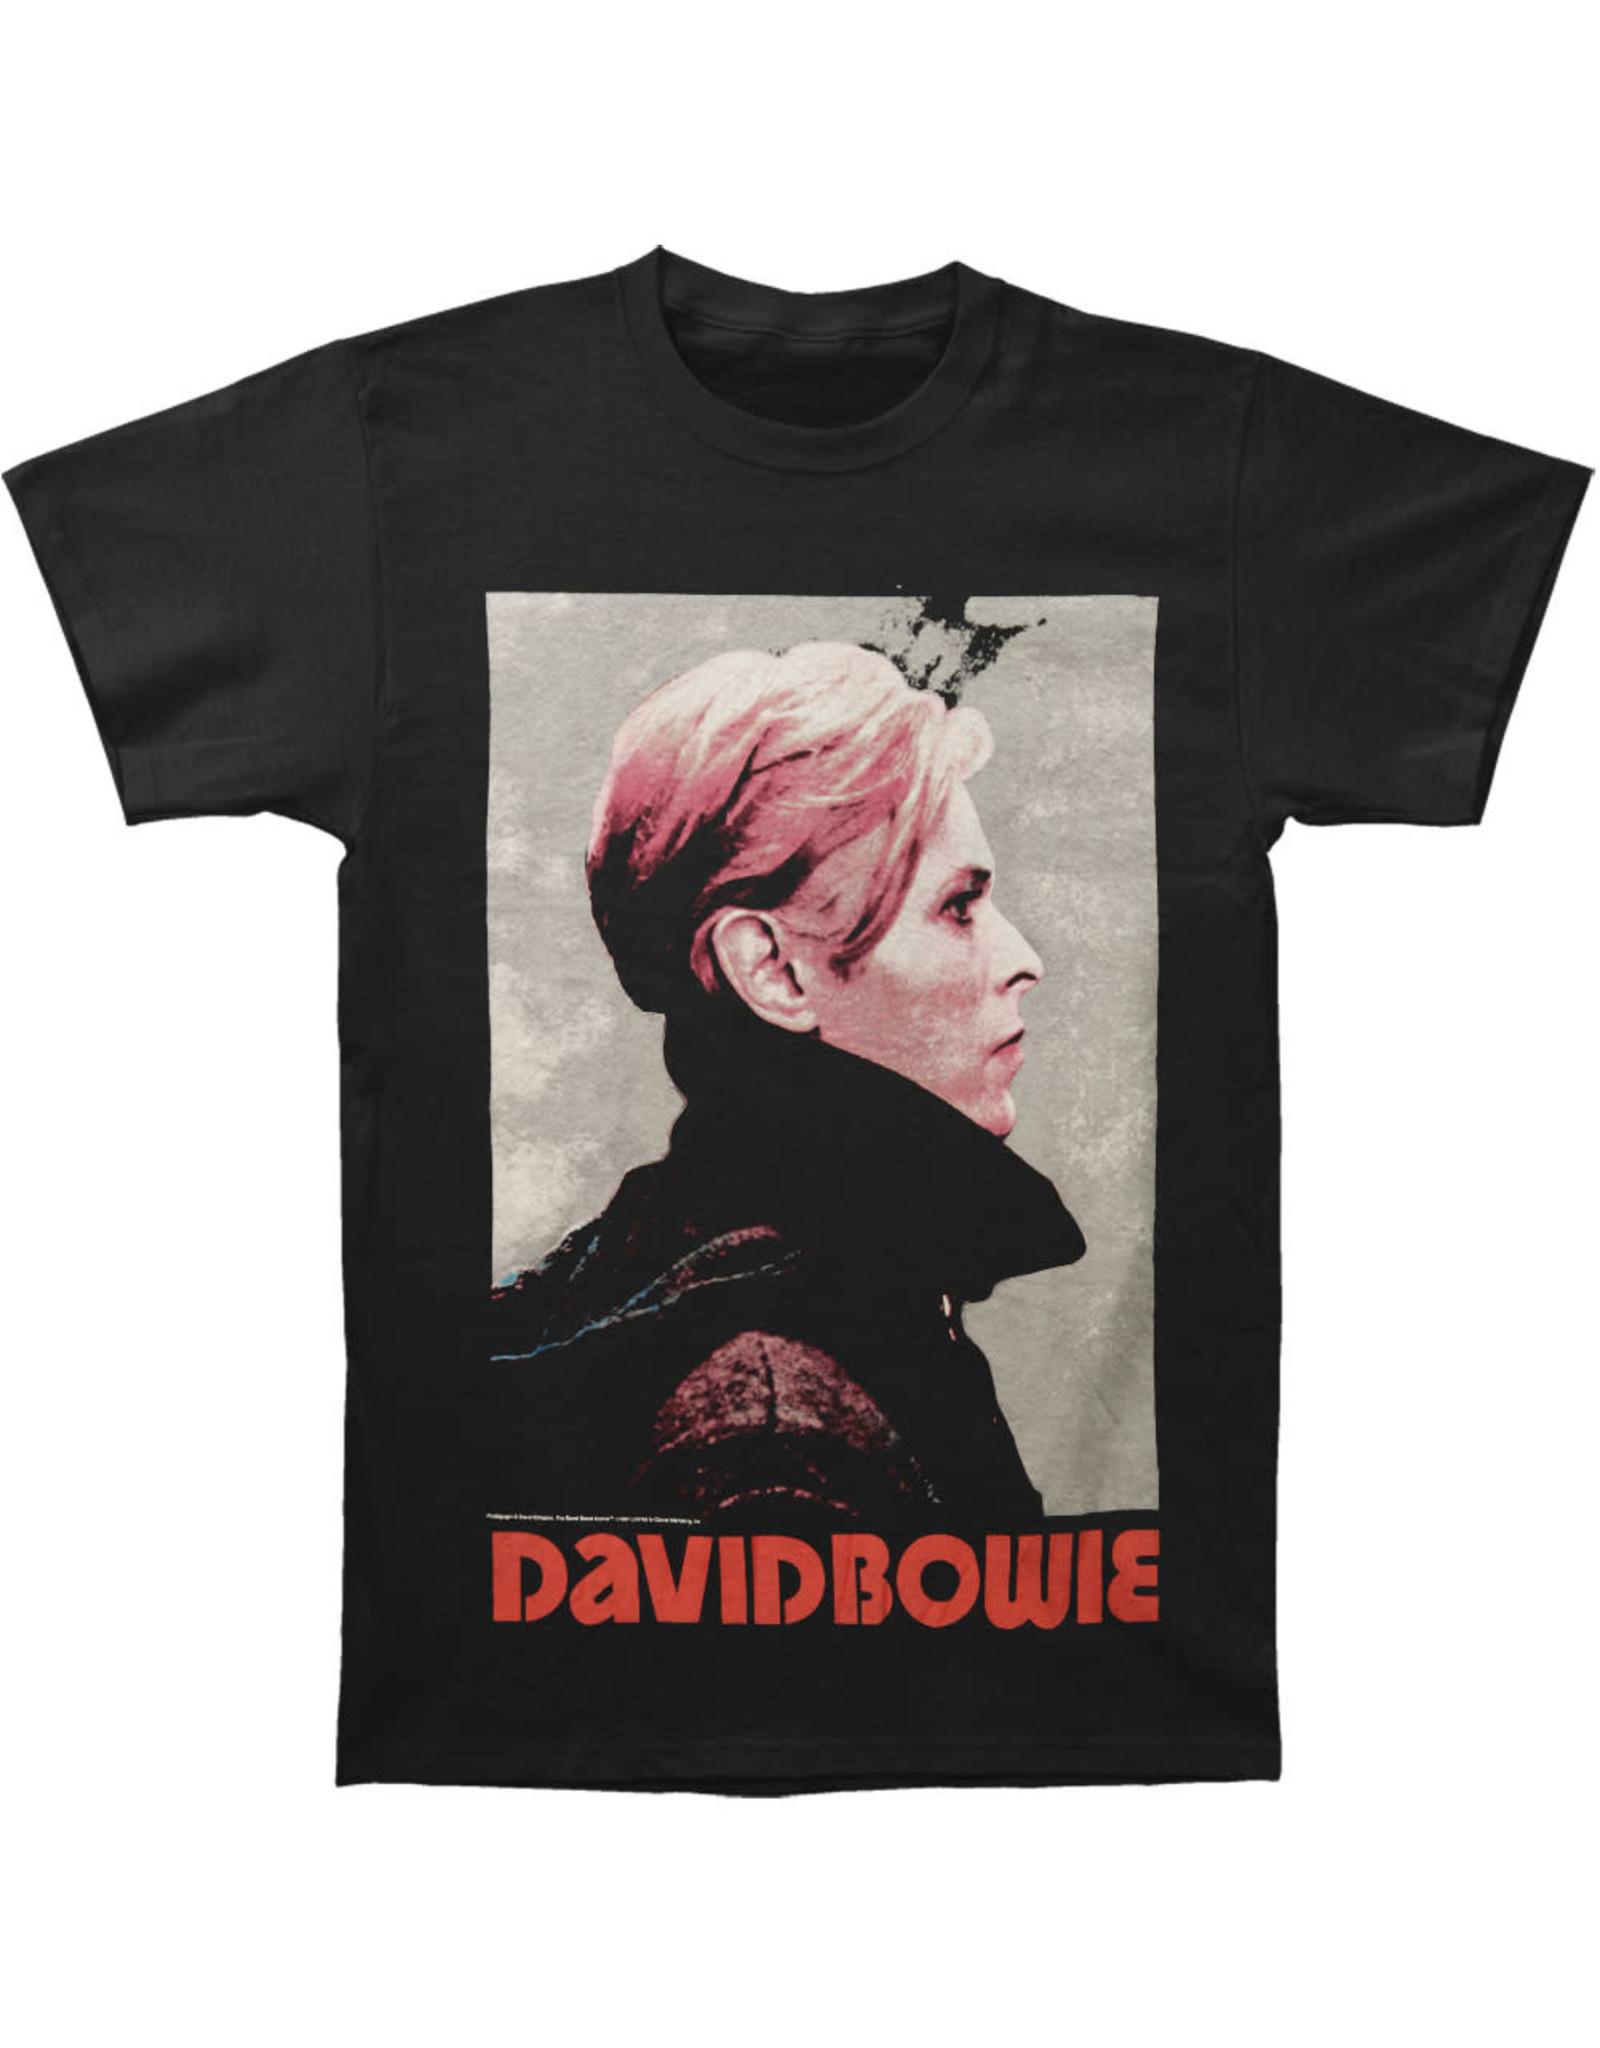 David Bowie / Low Portrait Tee